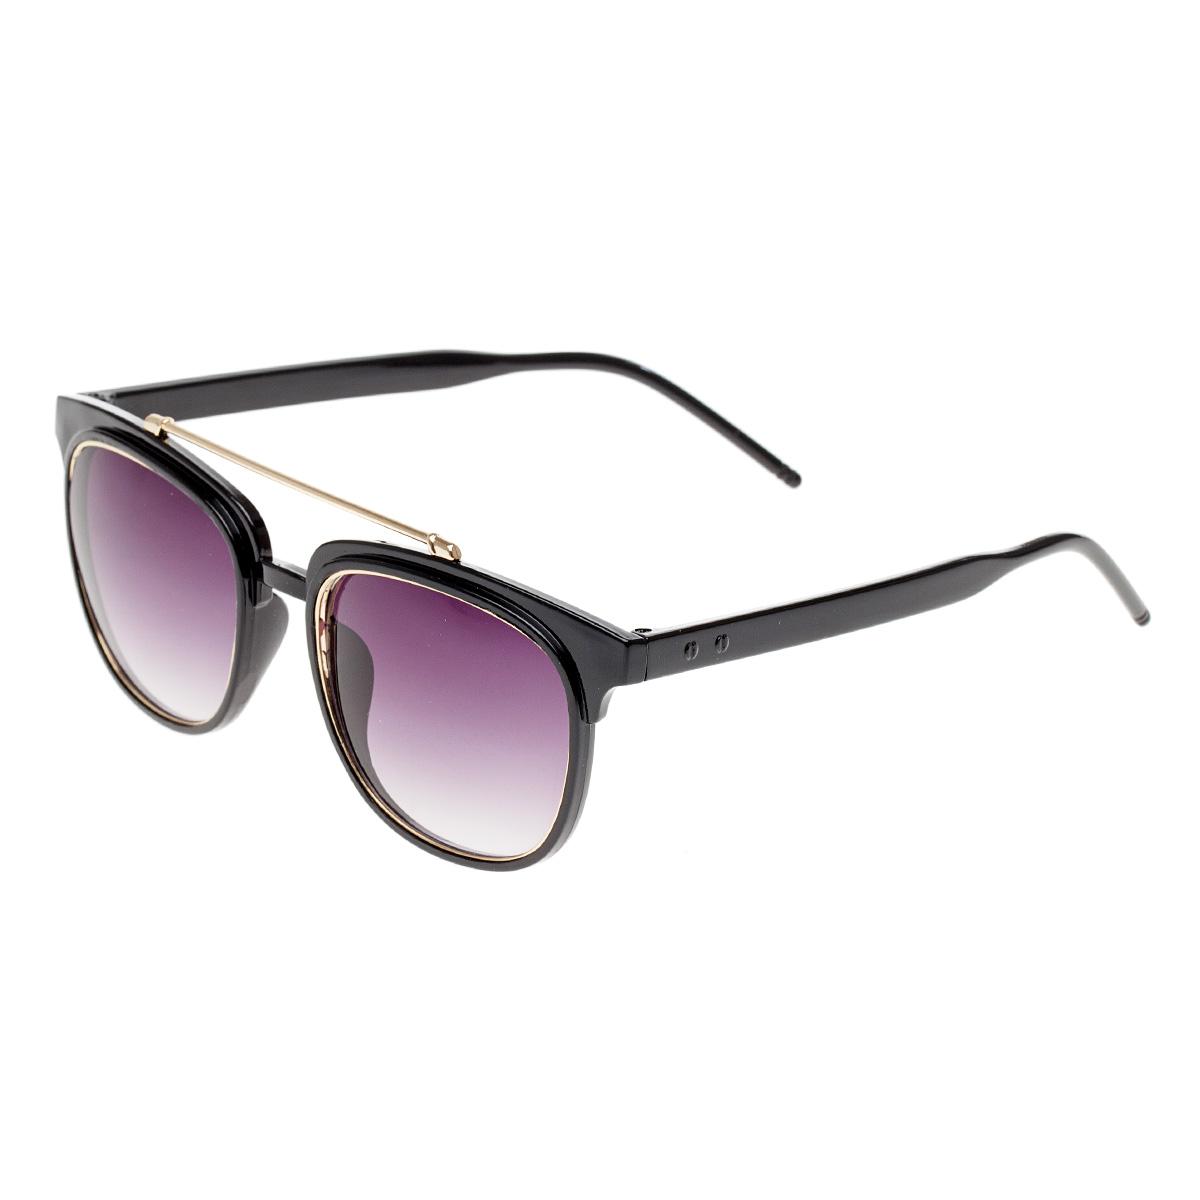 Фото - Очки солнцезащитные Sevenext, 23032-60 очки солнцезащитные sevenext 23032 28